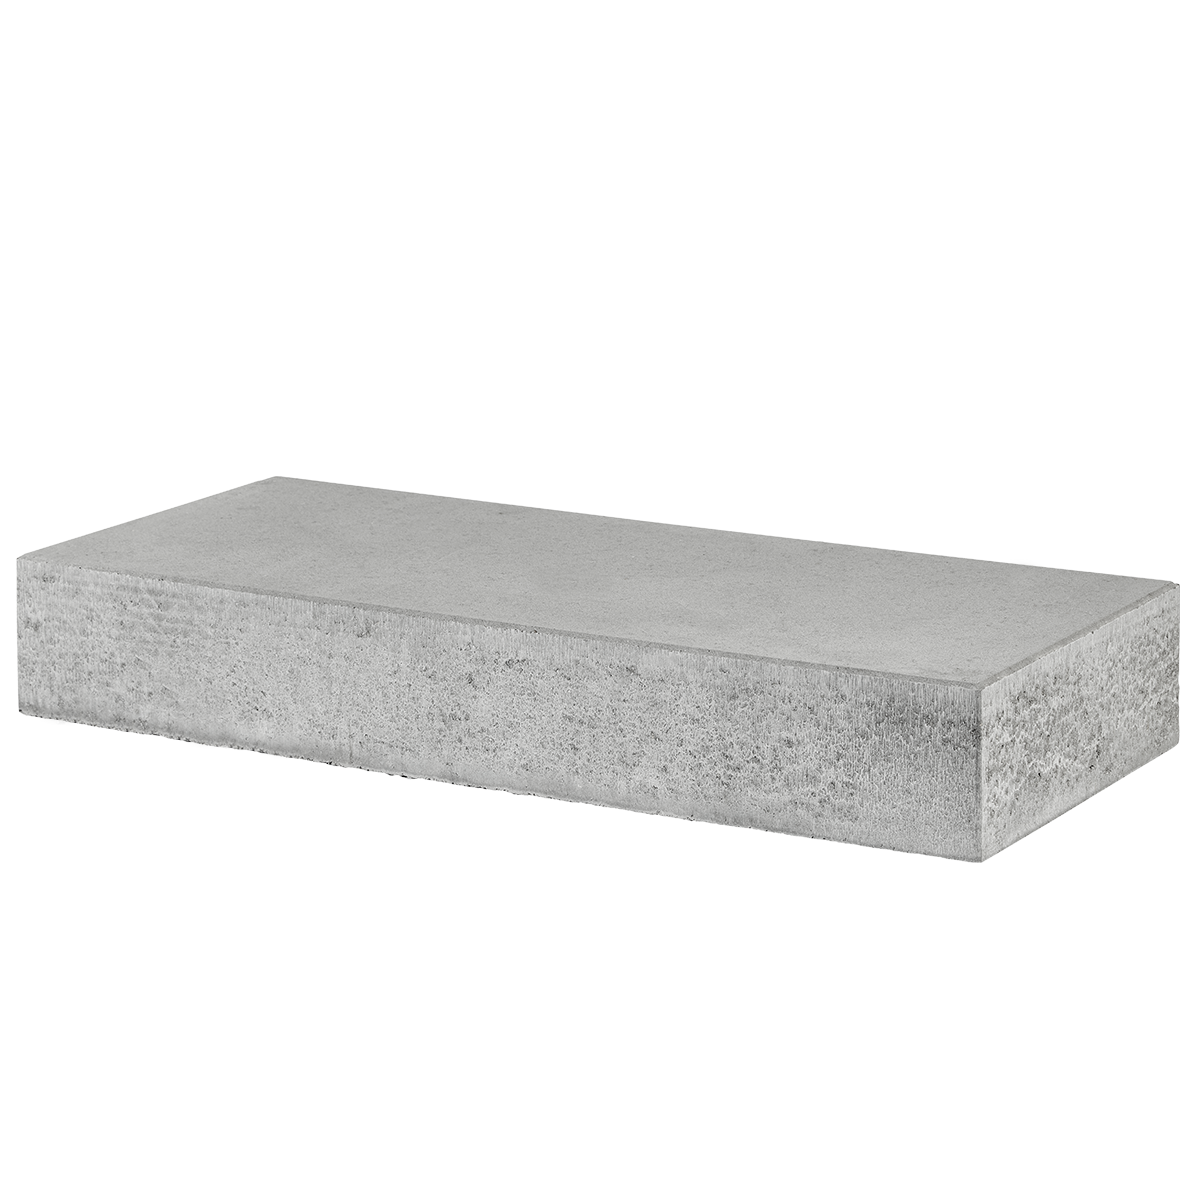 Trappetrin 100x40x15 cm Grå Lige kant